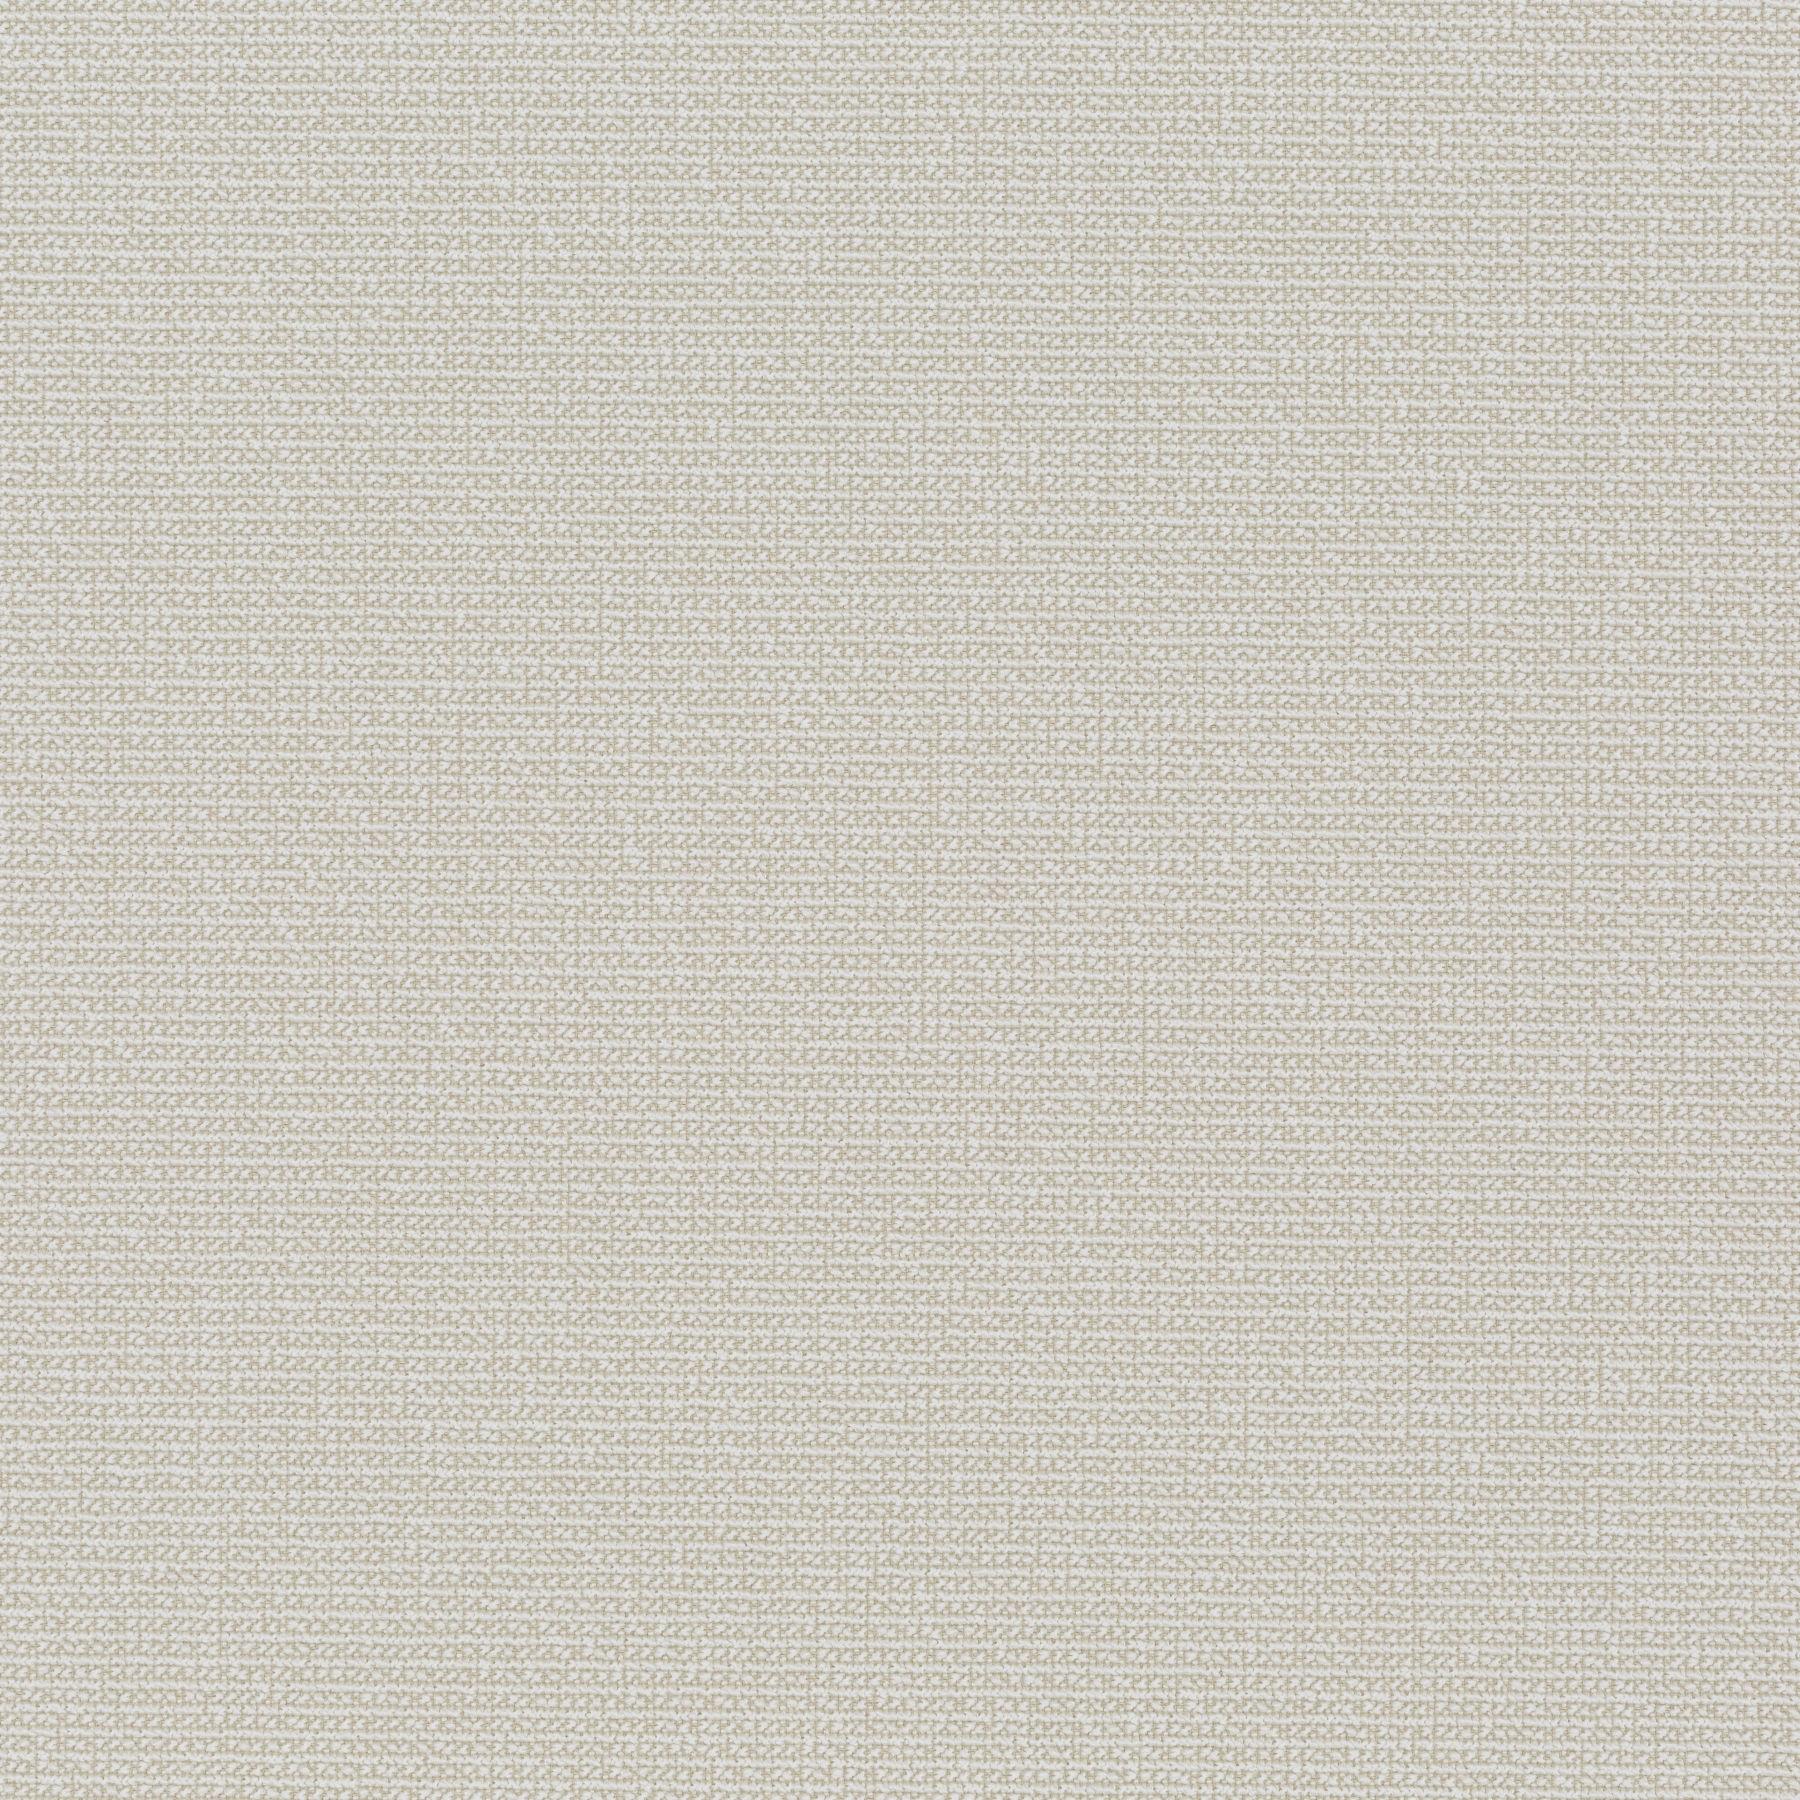 Upholstery Fabric Ronaldo 1 1378 070 | Jab Anstoetz Fabrics For Ronaldo Polyester Armchairs (View 12 of 15)